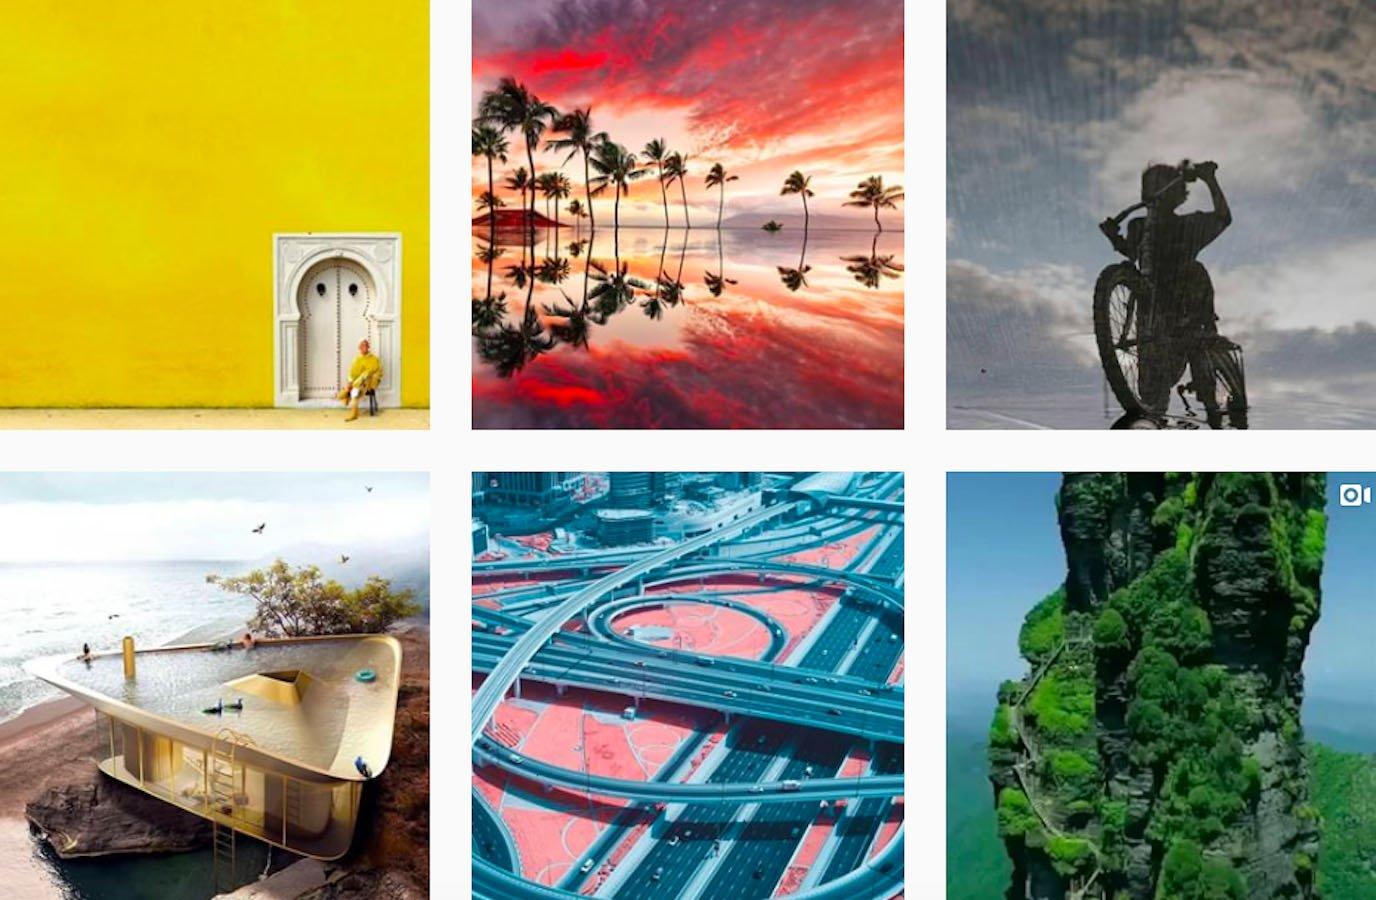 Web Design Inspiration: 110+ Accounts On Instagram and 10+ Best UX & Web Design Books in 2020 - fubiz